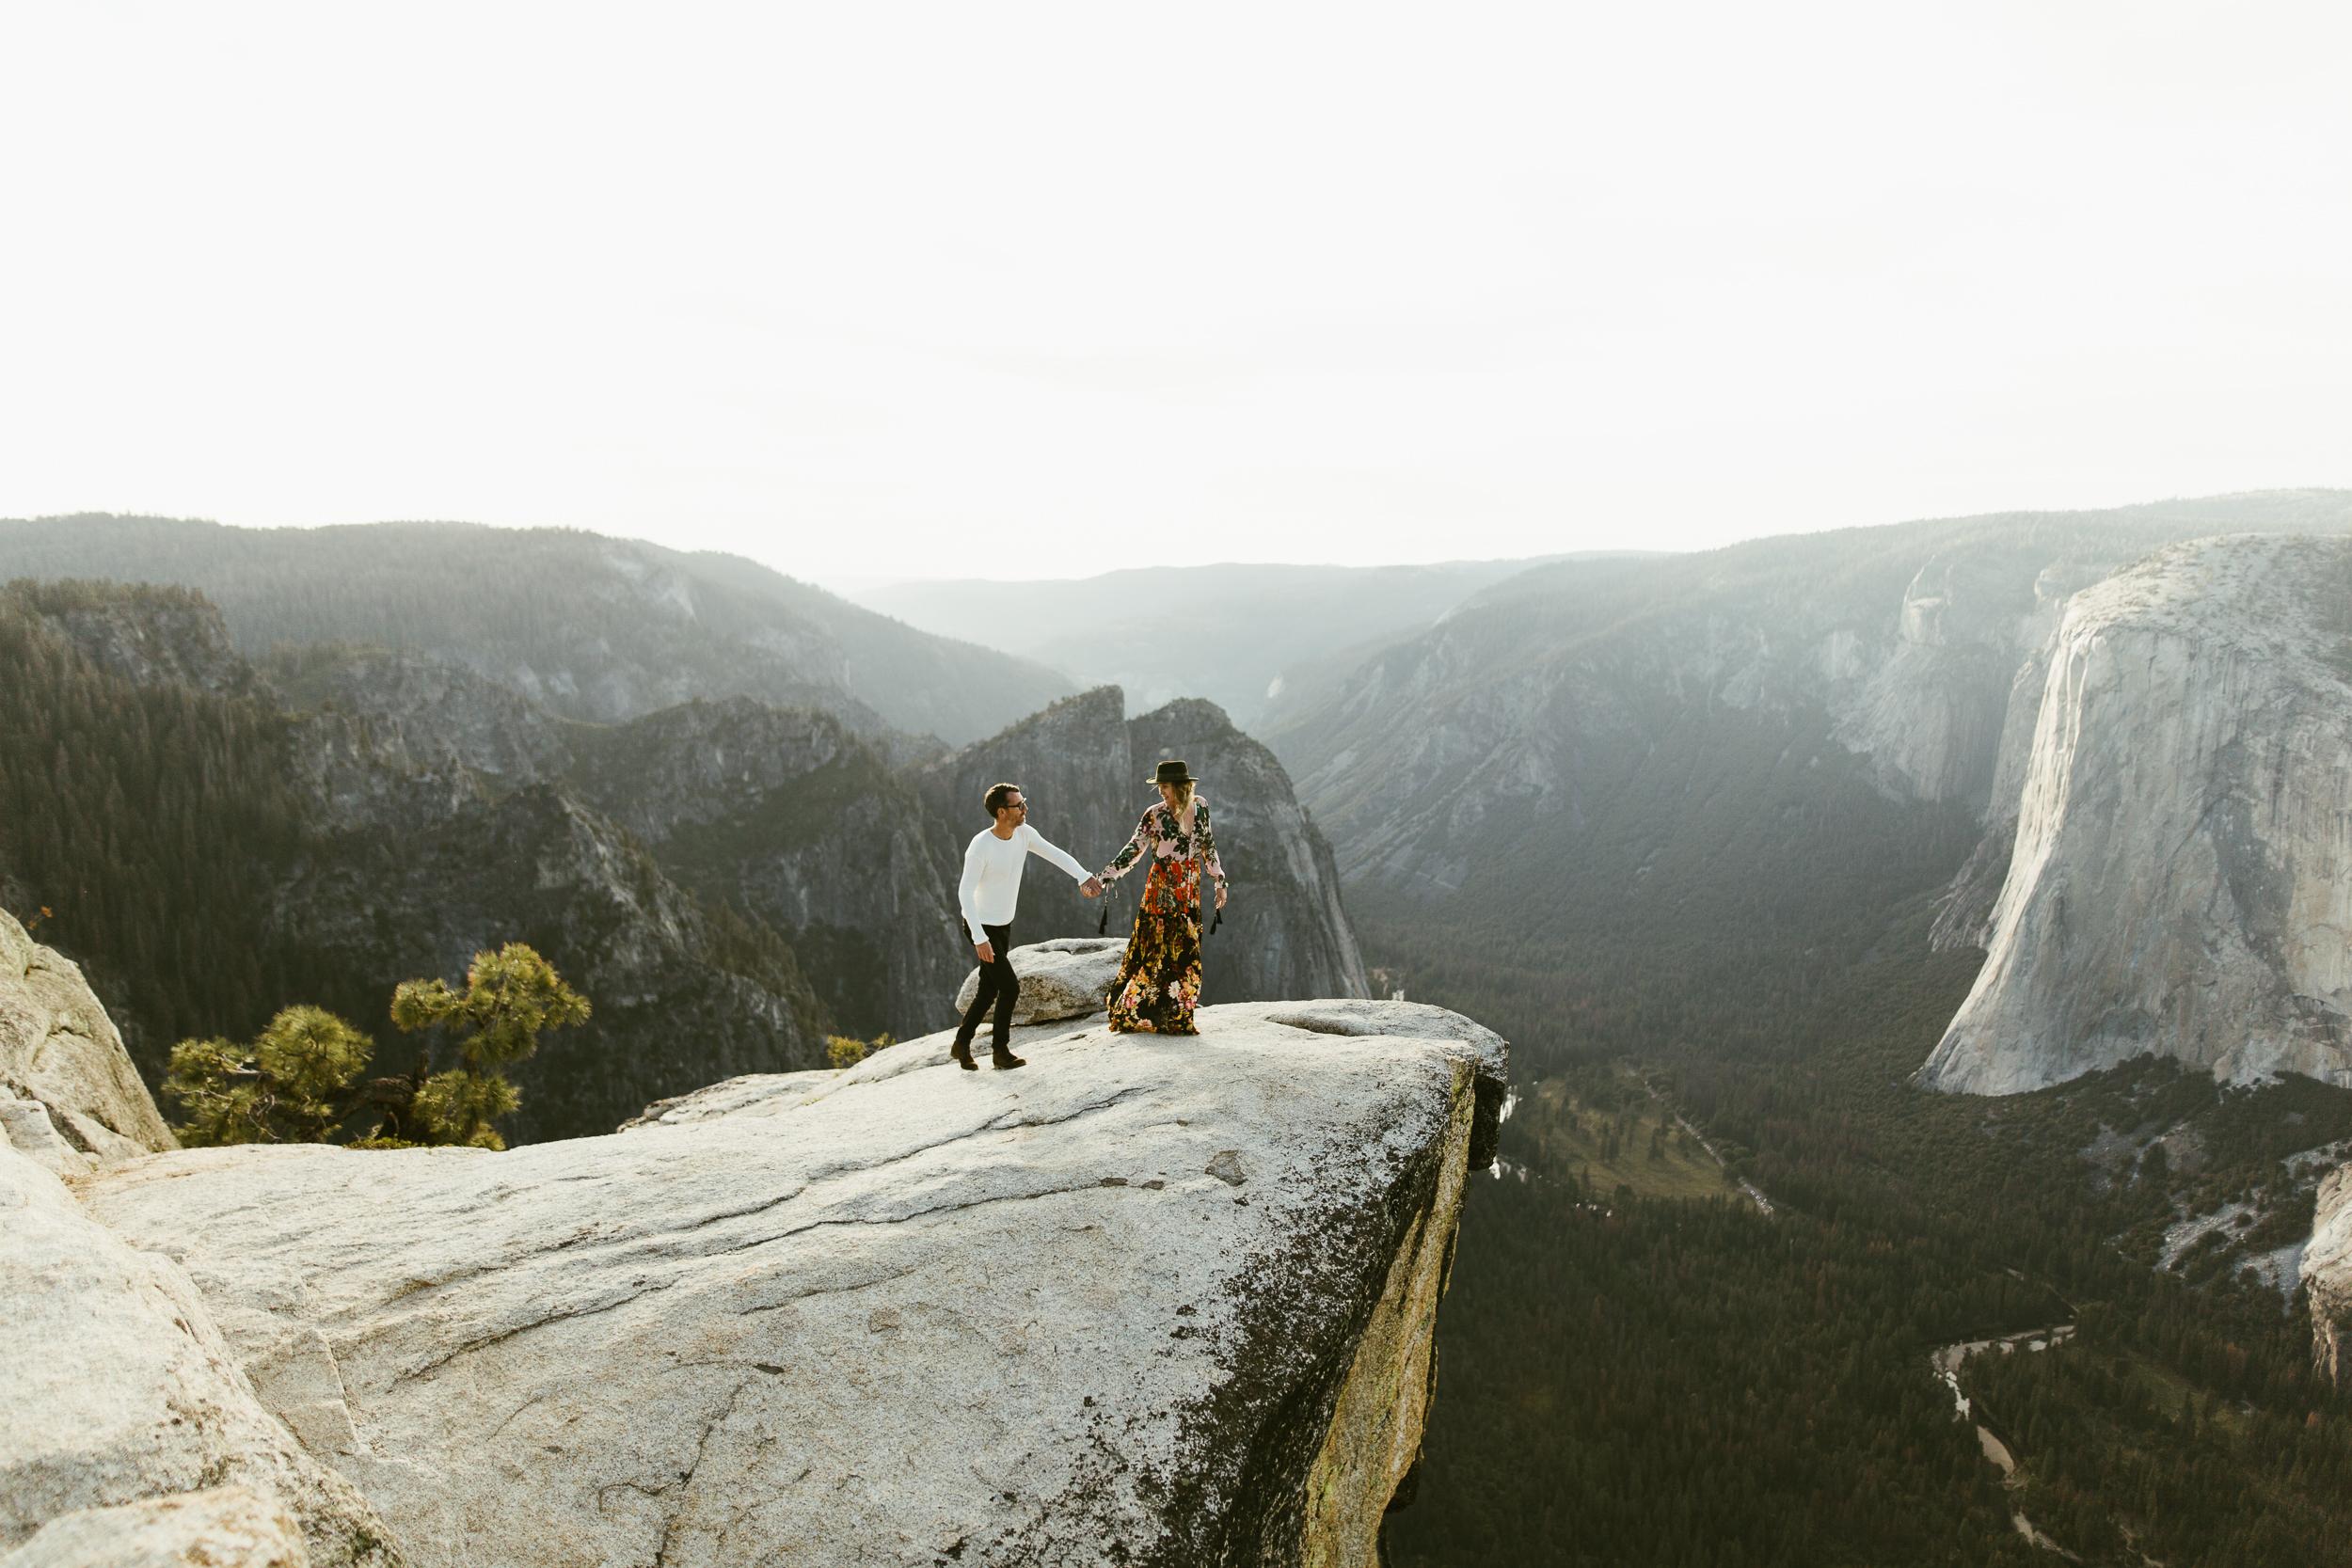 YosemiteElopementPhotographyJacquesFlynnLisaKarst10.jpg